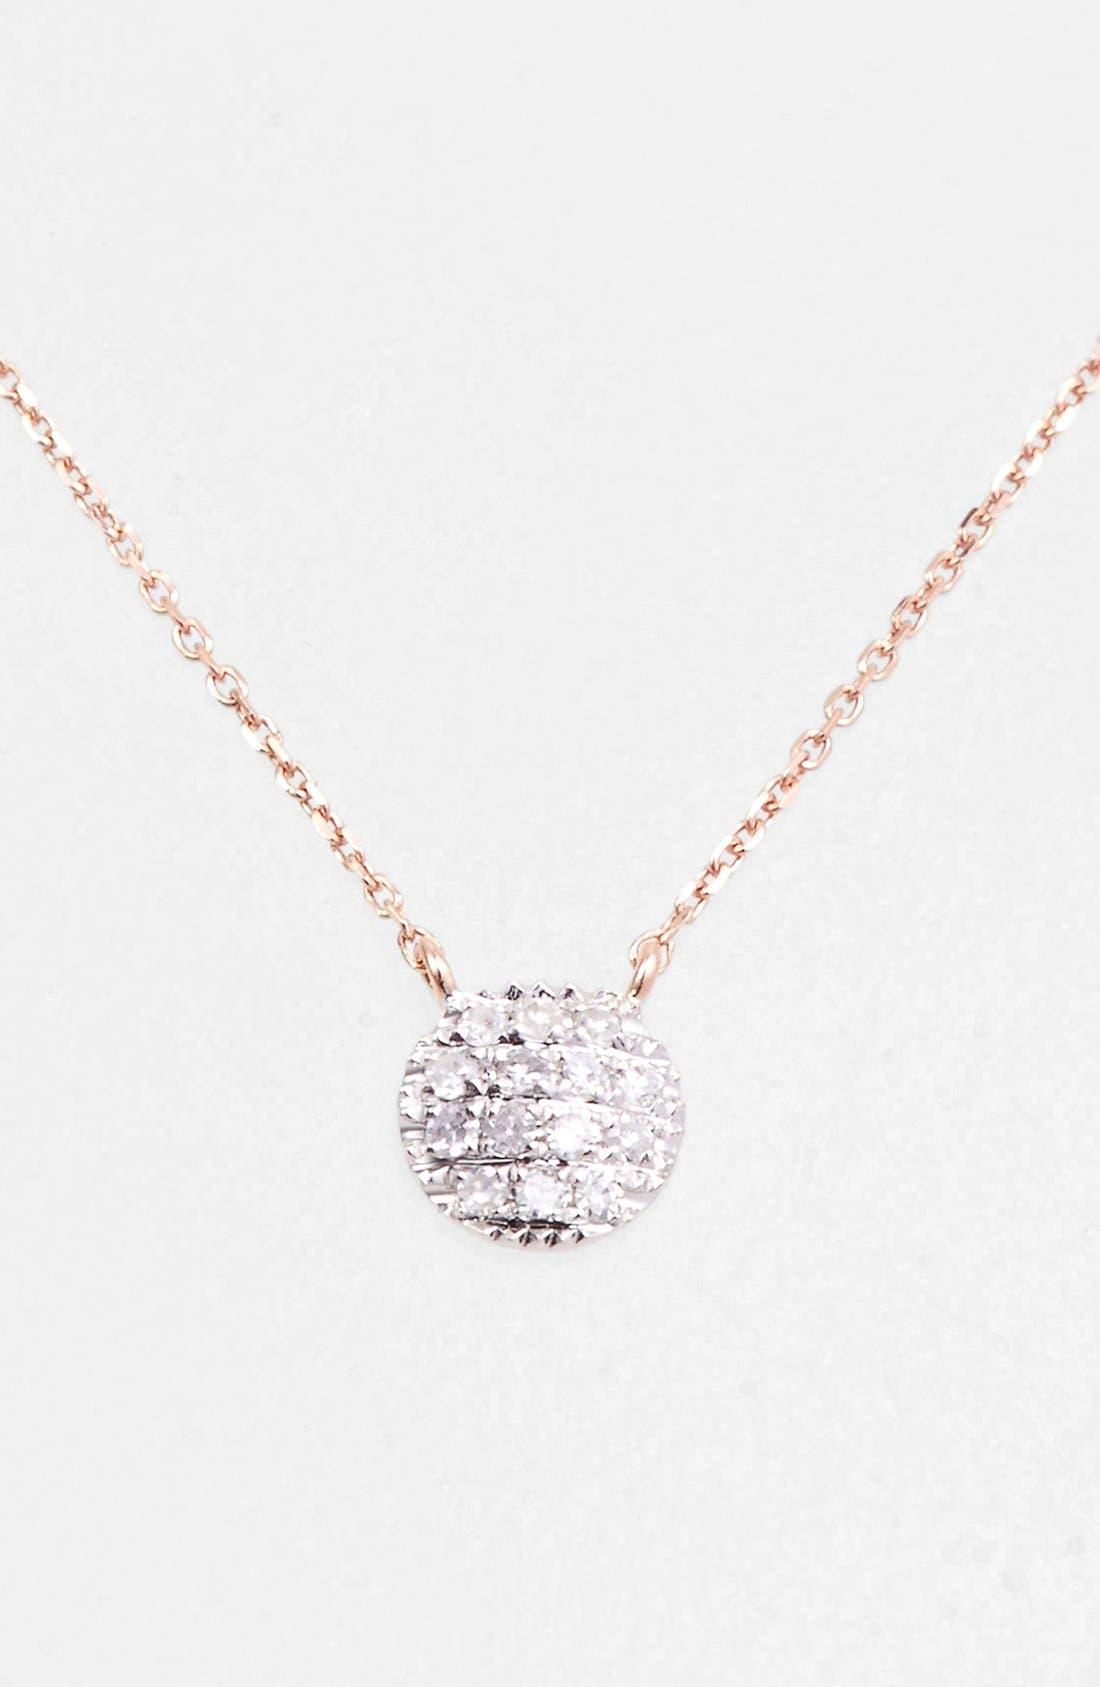 Alternate Image 1 Selected - Dana Rebecca Designs 'Lauren Joy' Diamond Disc Pendant Necklace